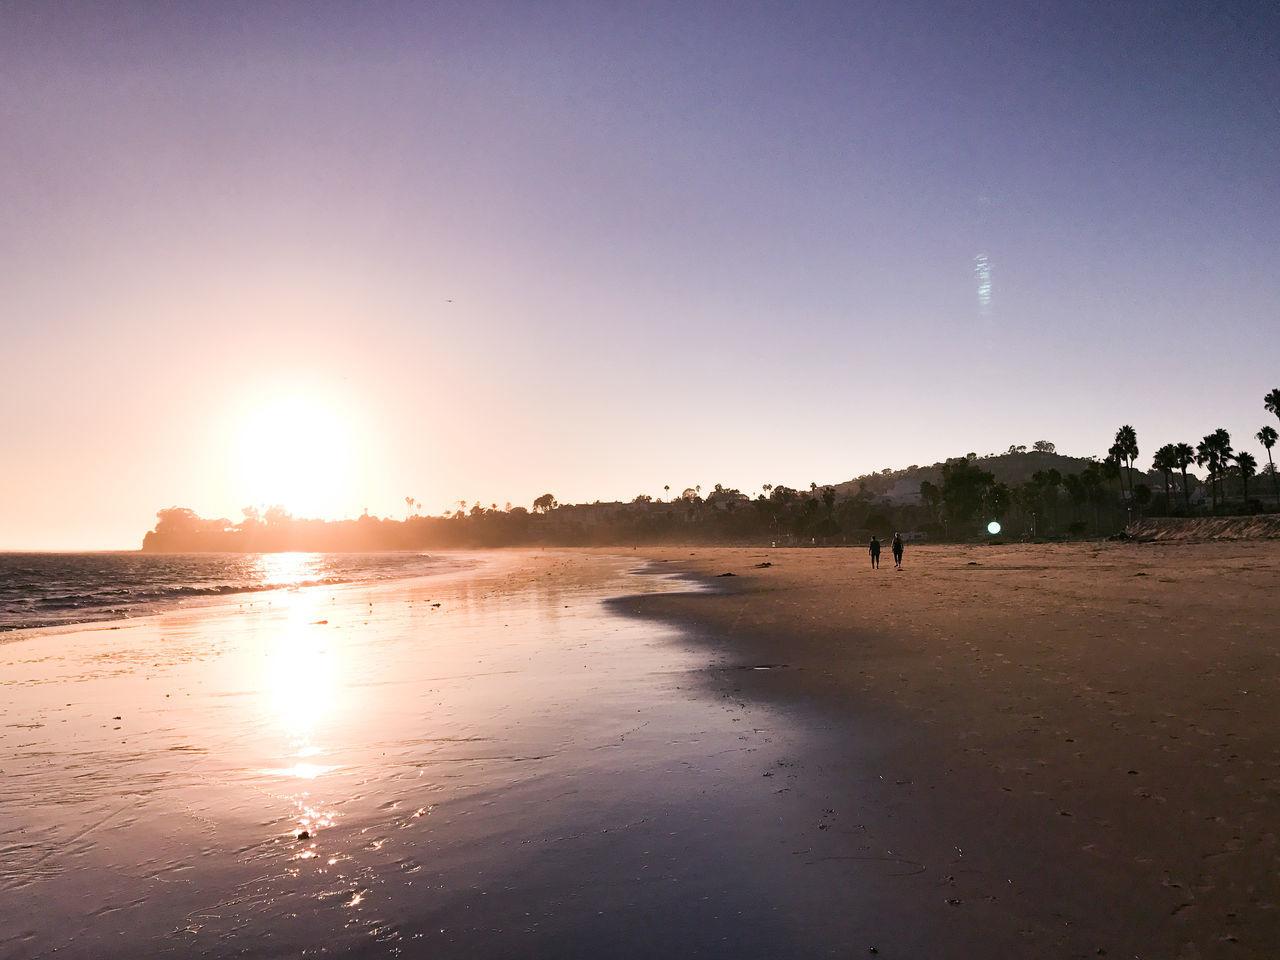 Adult Adults Only Beach Beauty In Nature Day Nature Outdoors People Sand Santa Barbara Santa Barbara, CA Sea Sky Sun Sunset